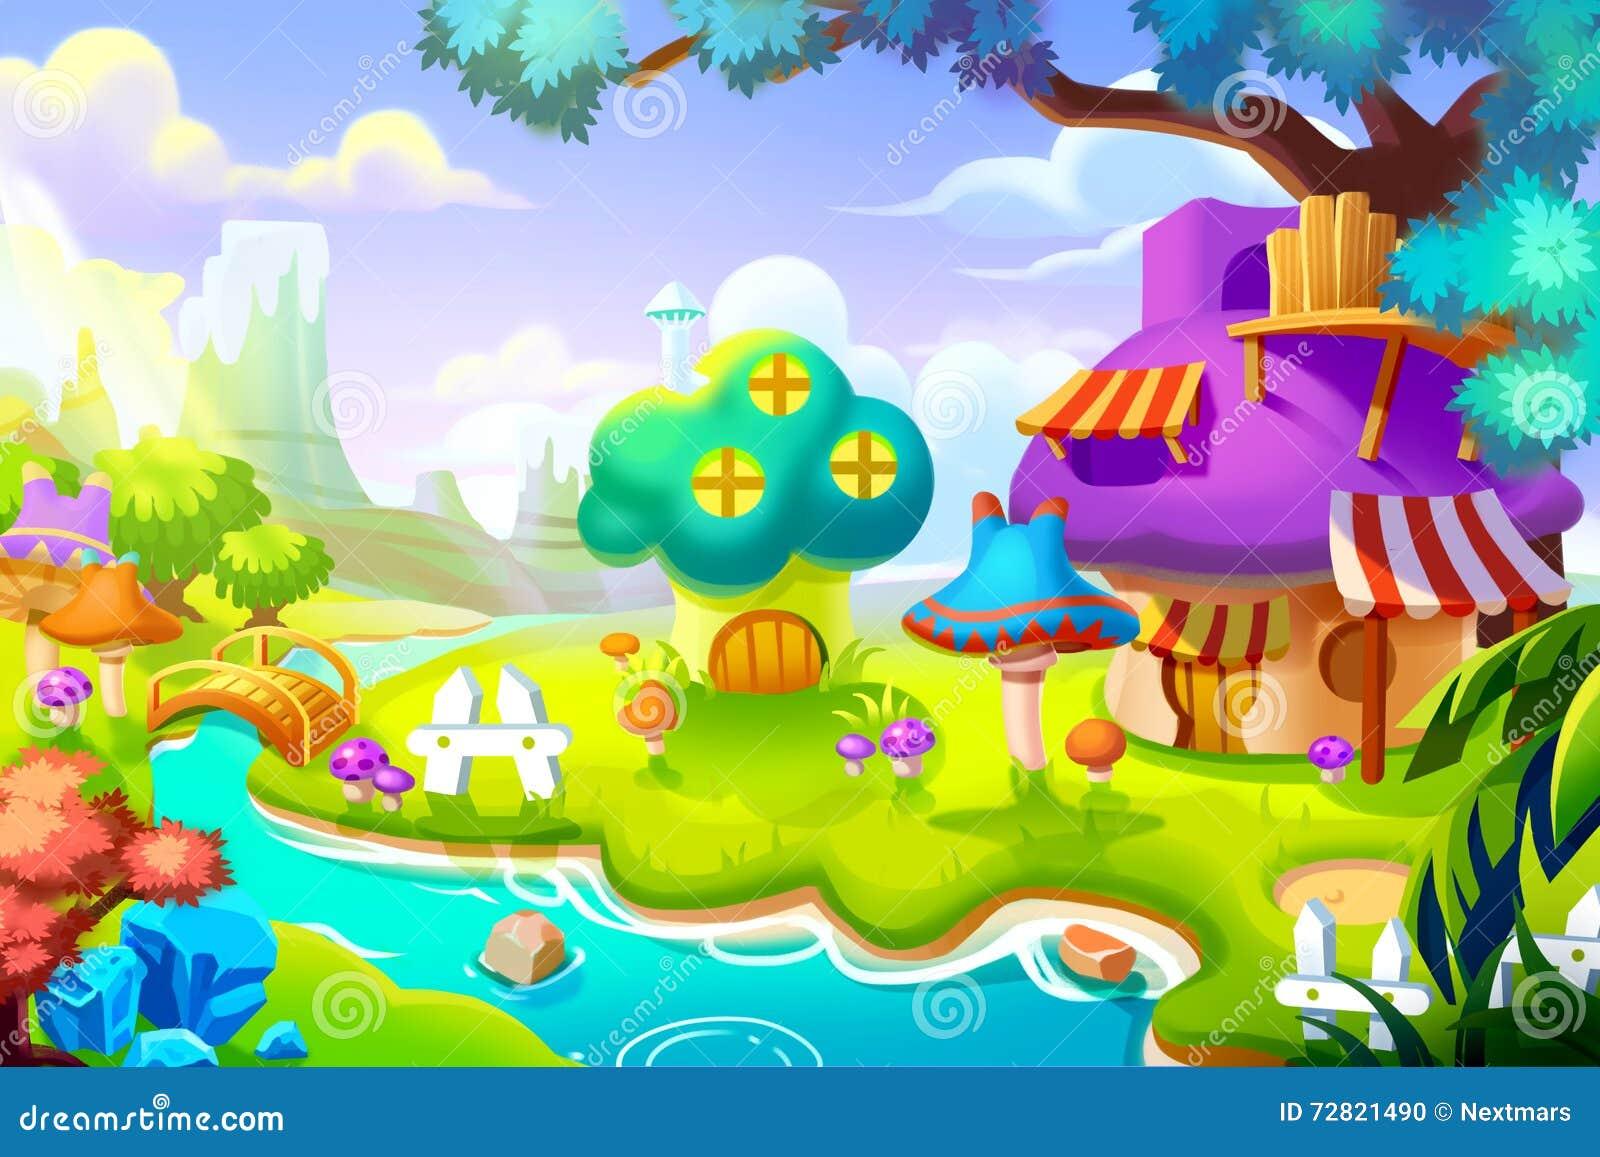 Stock Illustration Creative Illustration Innovative Art Forest House Colorful Nature Land Realistic Fantastic Cartoon Style Artwork Scene Image72821490 on 3d Home Design 7 Sweet –